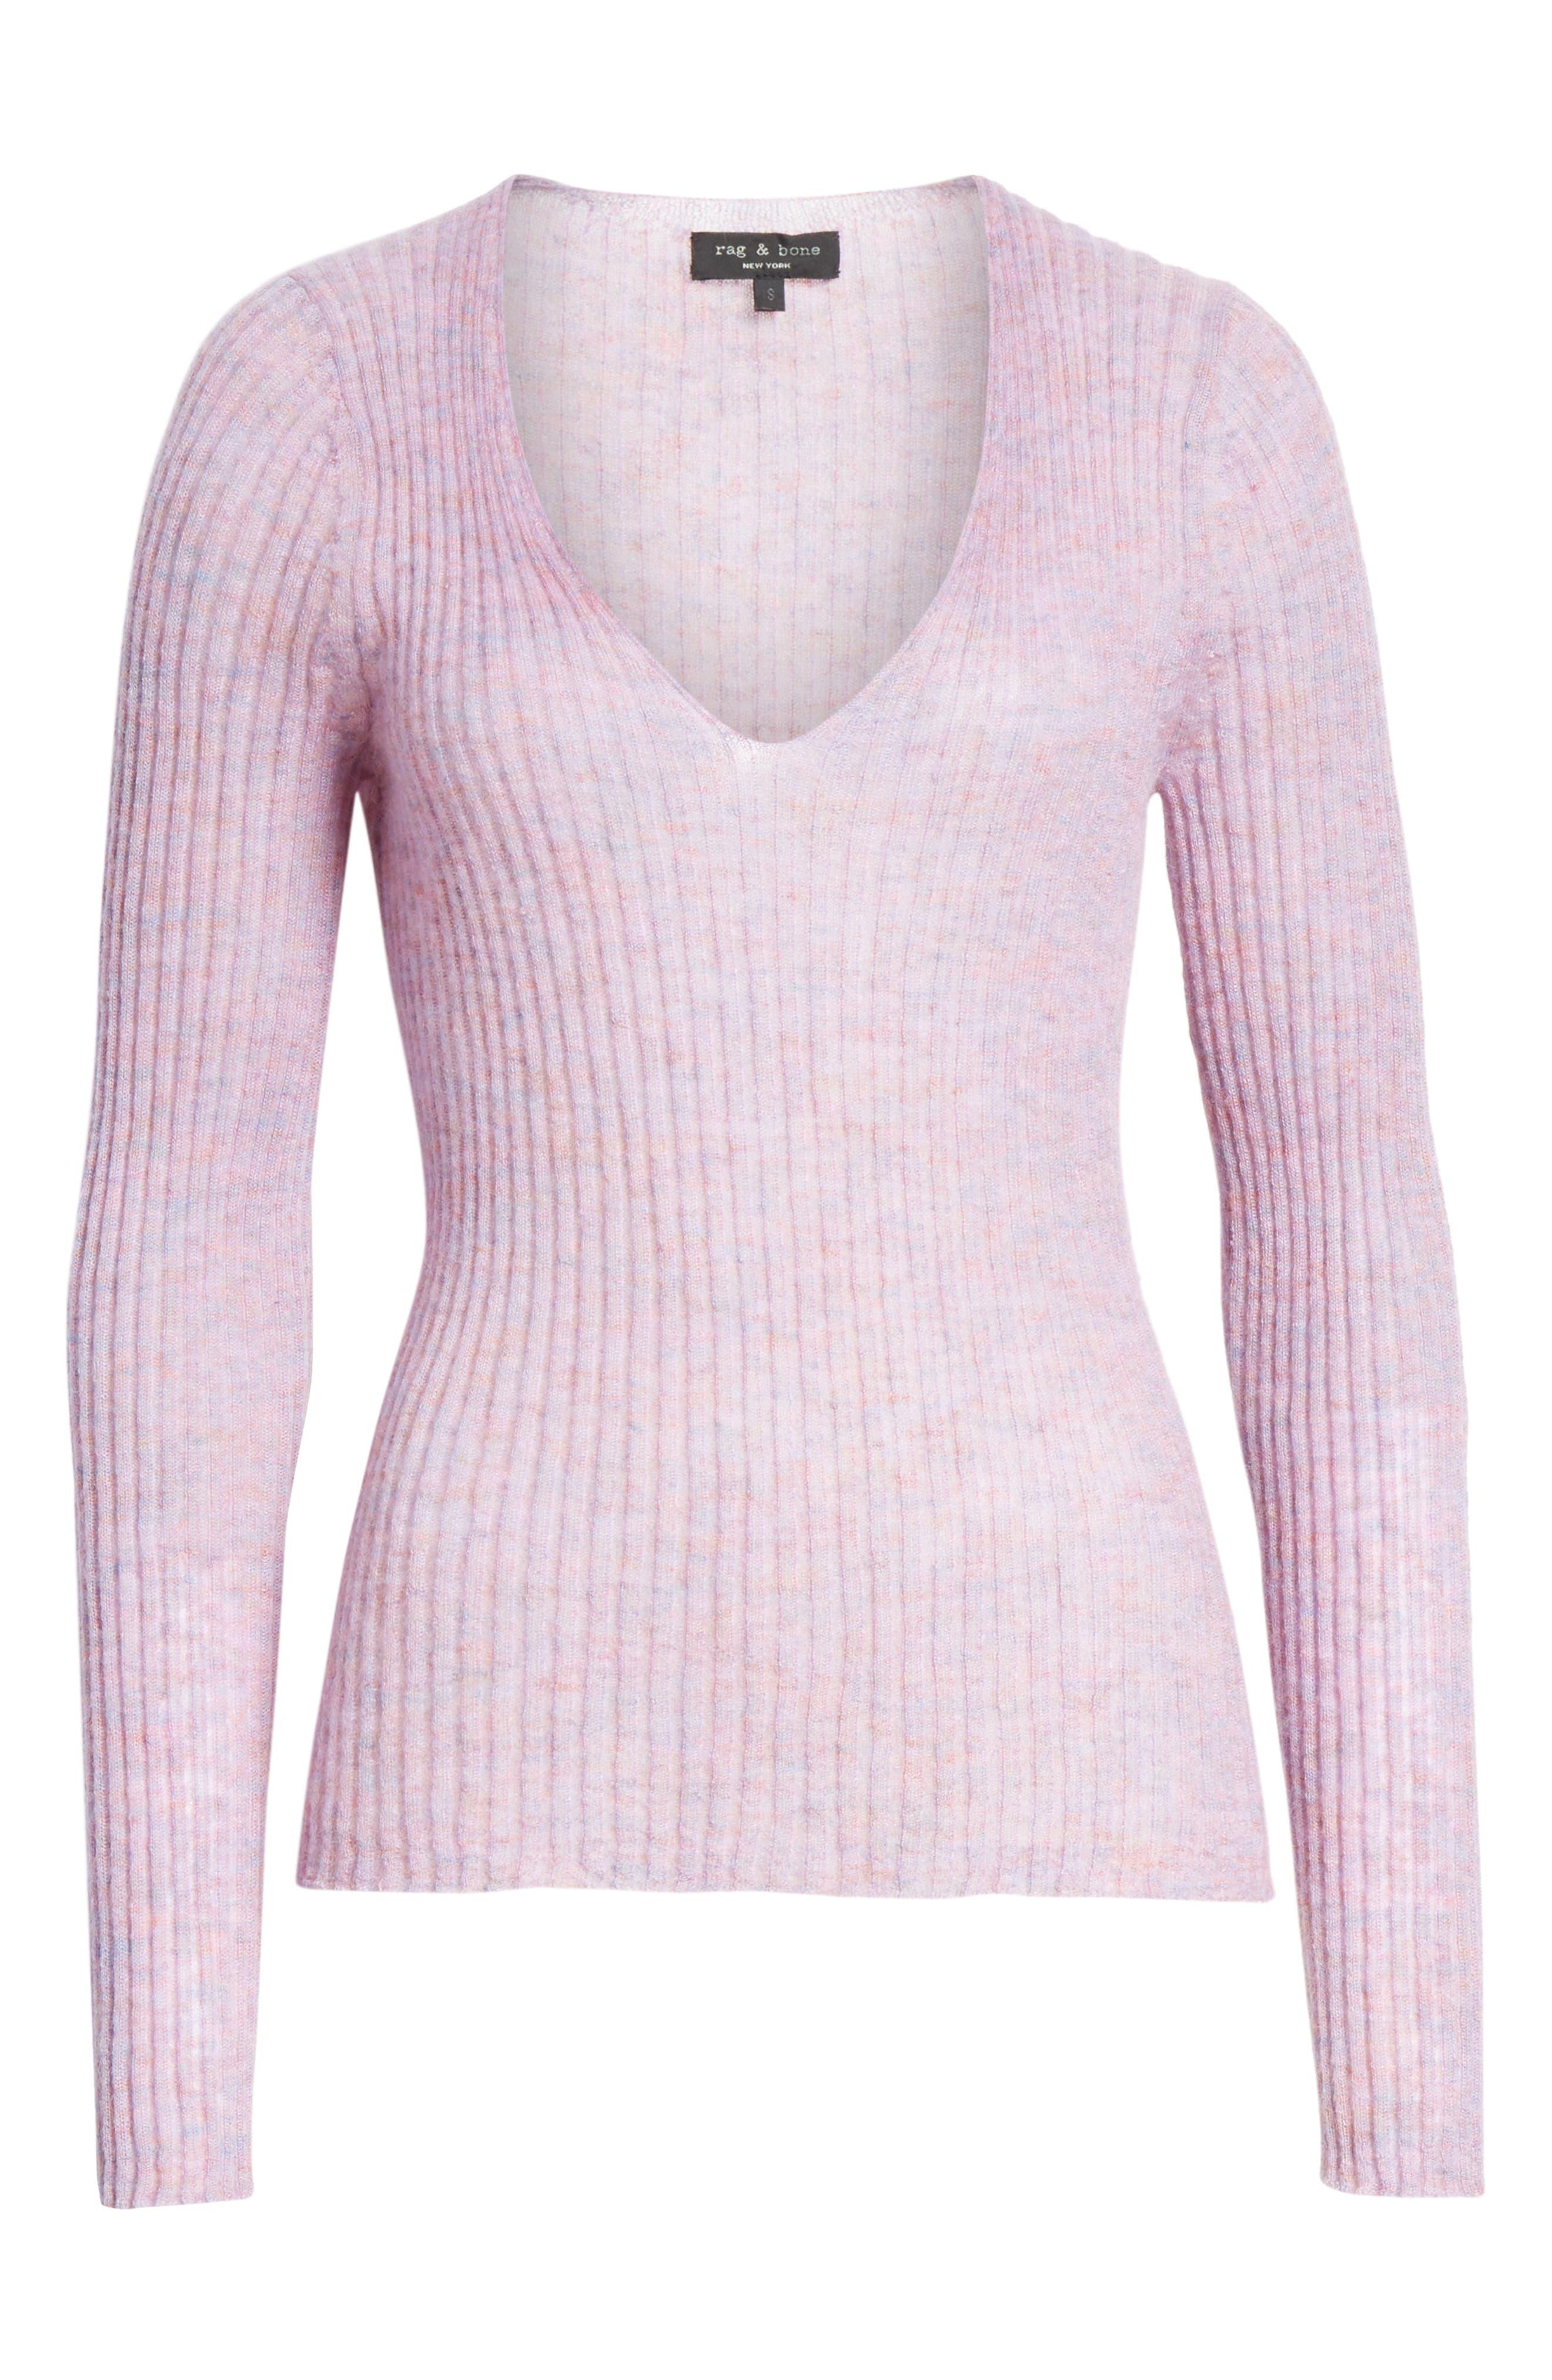 RAG & BONE, Donna Mohair Blend Sweater, Alternate thumbnail 6, color, LILAC